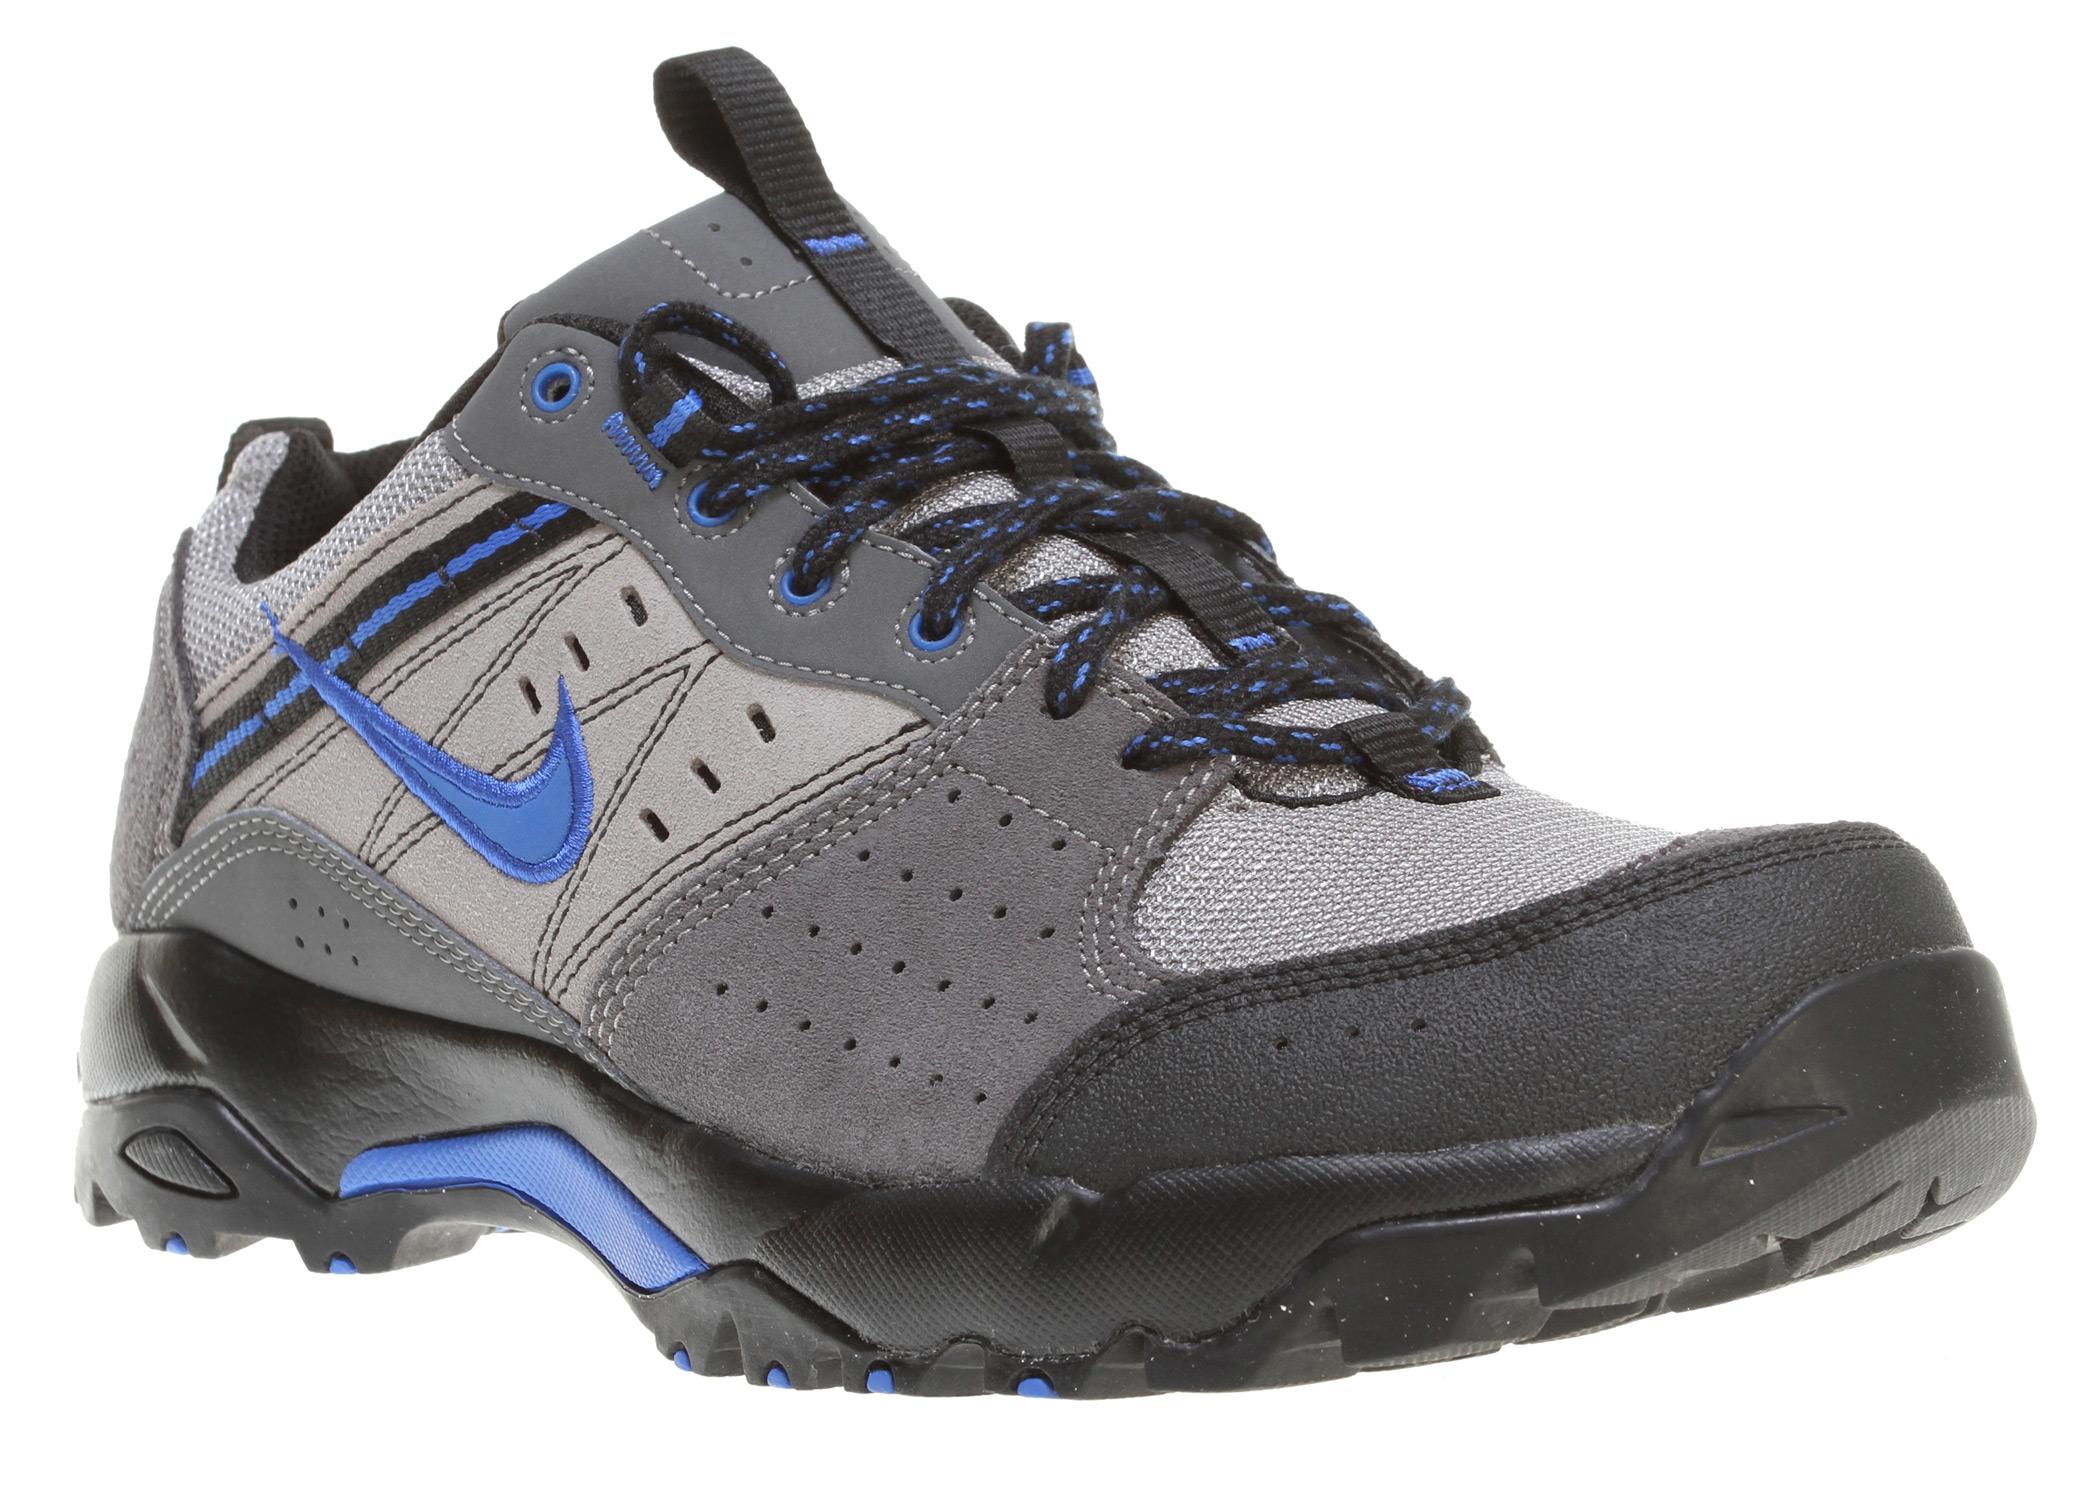 nike hiking shoes nike salbolier hiking shoes - thumbnail 2 NAQLRHF